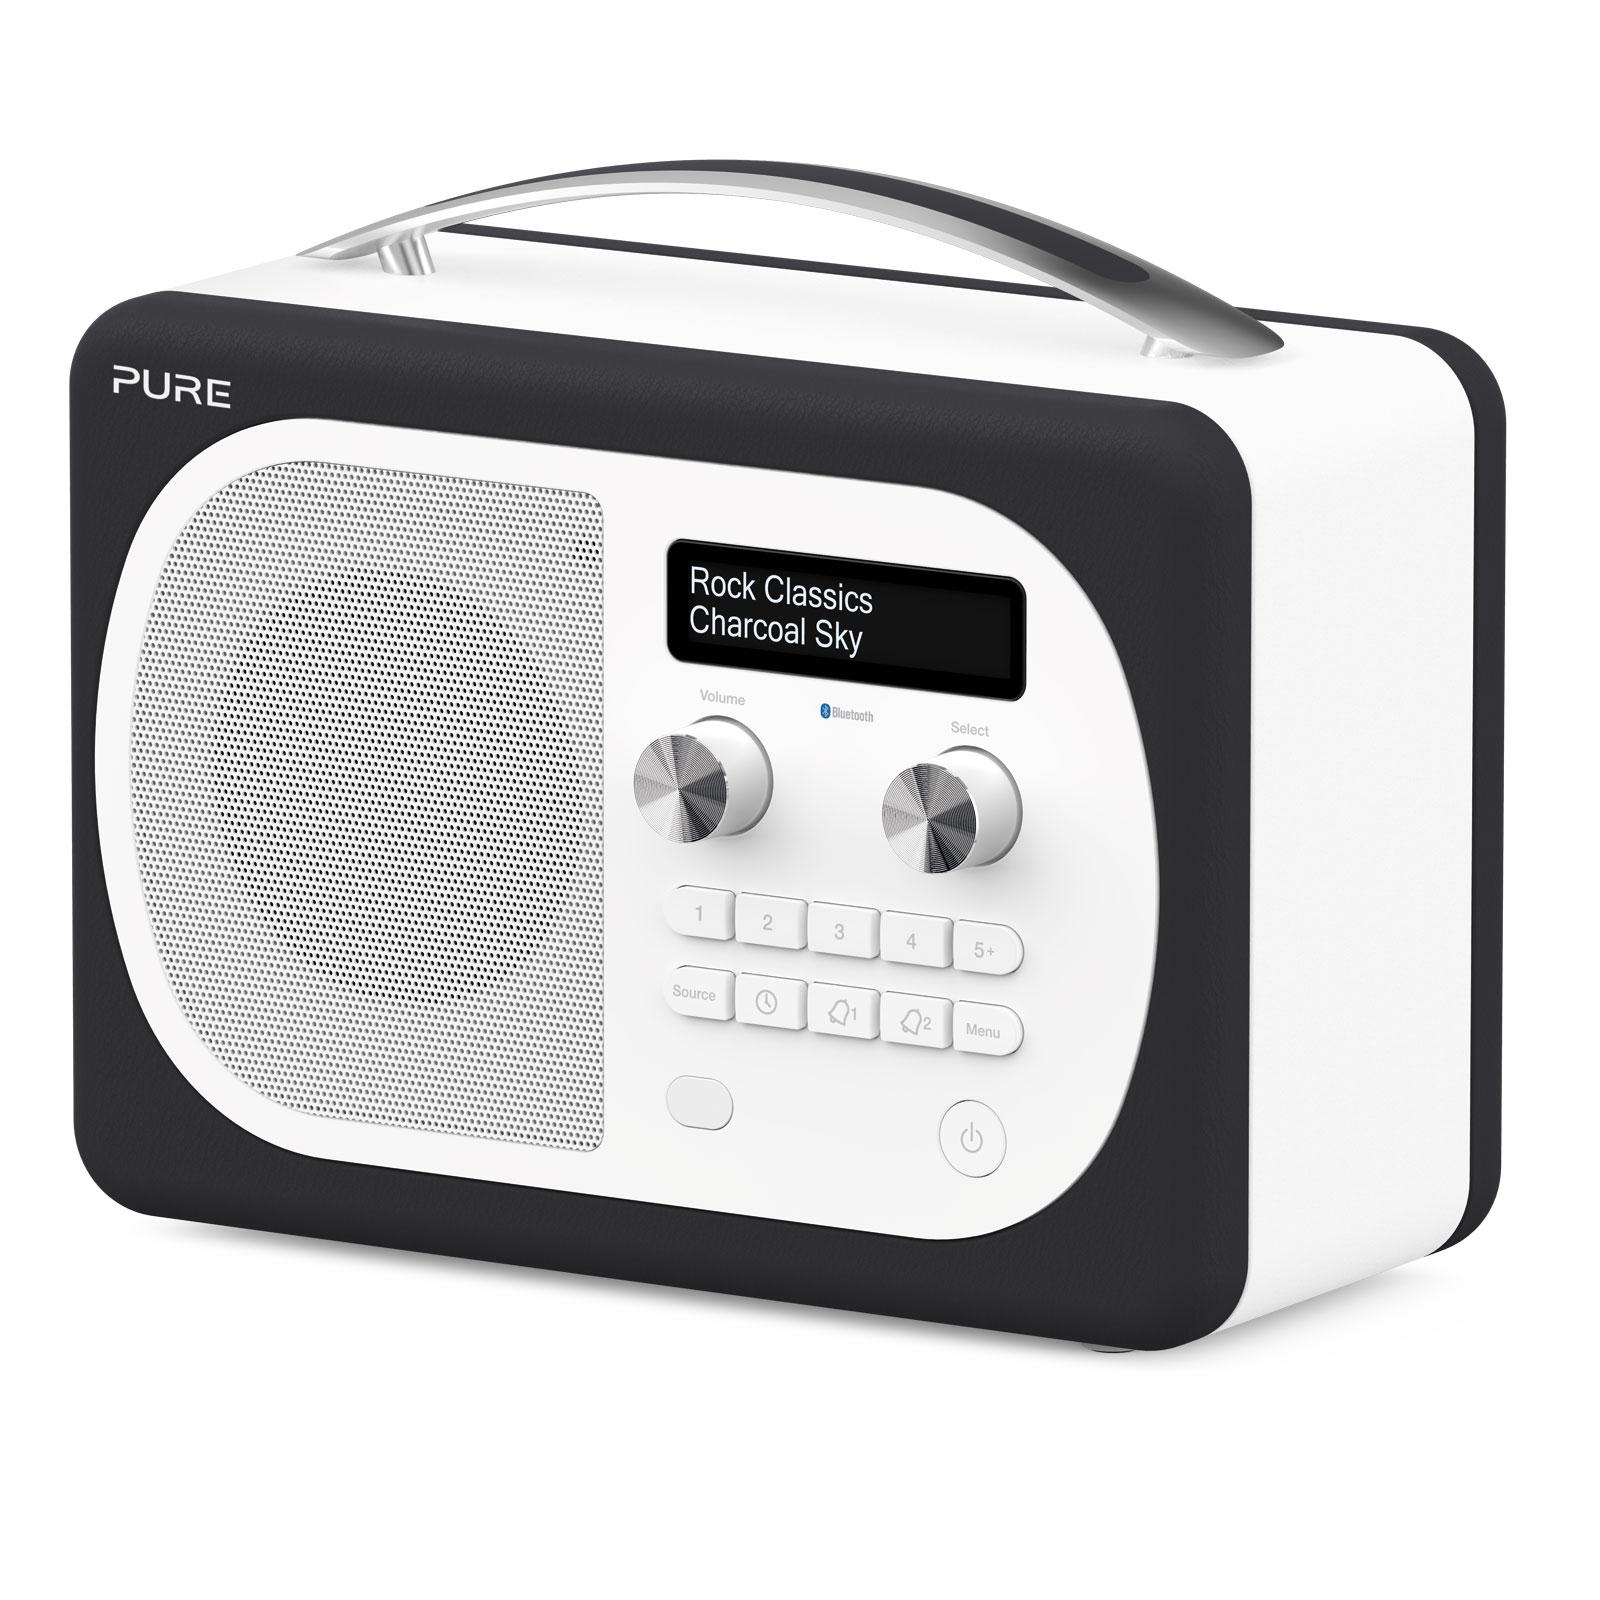 pure evoke d4 mio bluetooth charcoal radio radio. Black Bedroom Furniture Sets. Home Design Ideas